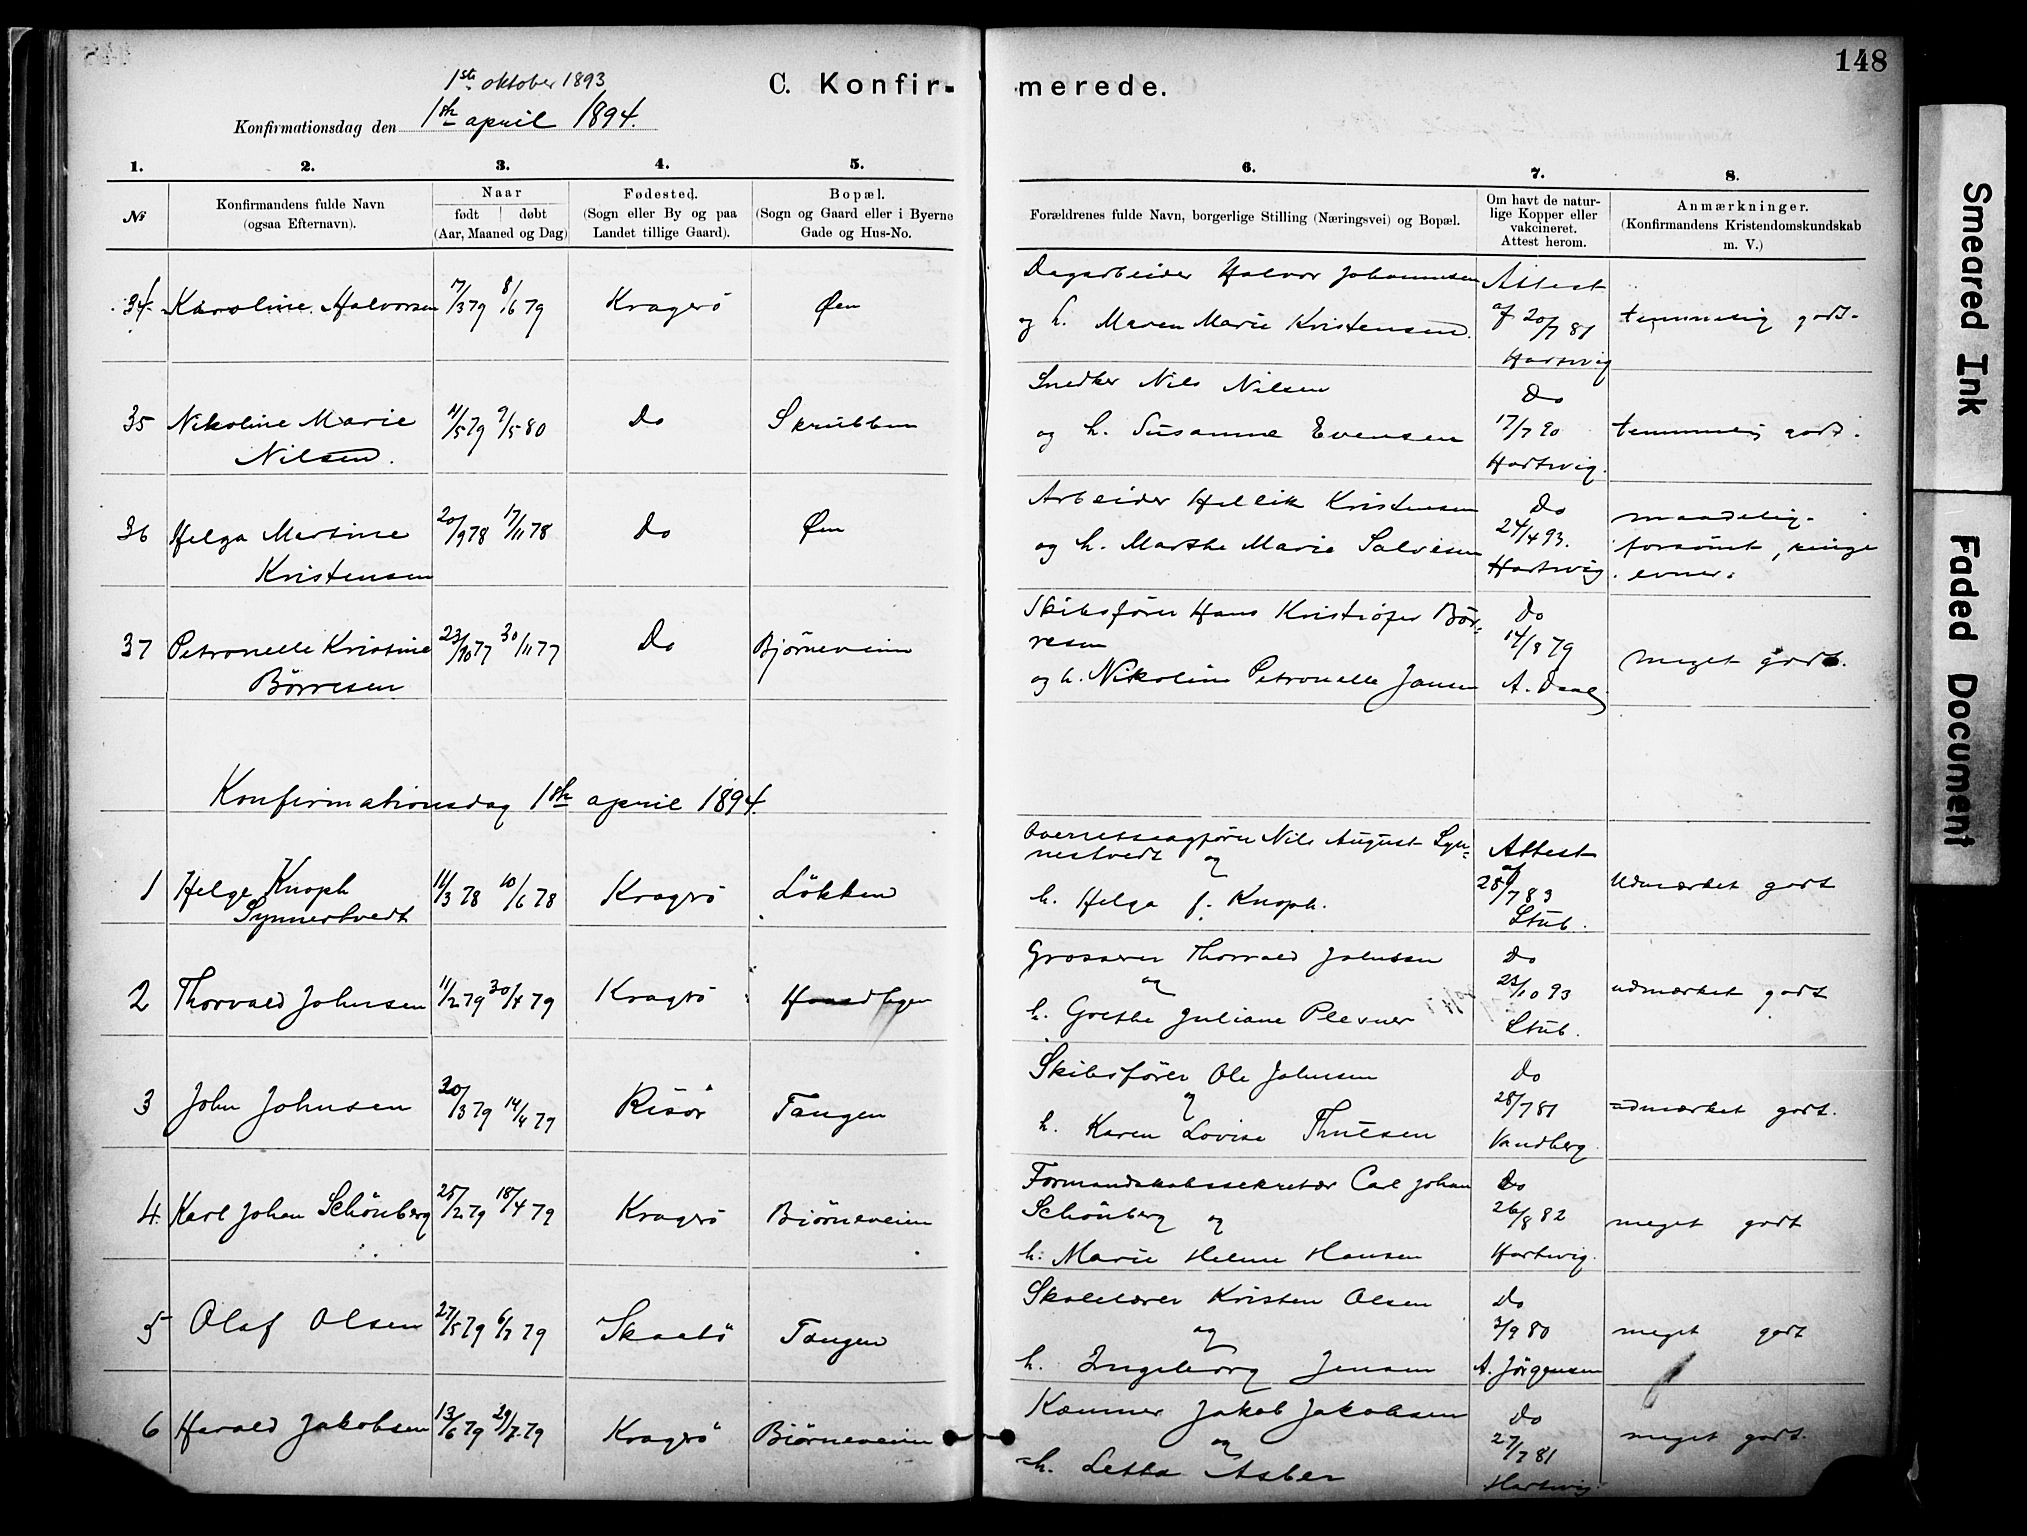 SAKO, Kragerø kirkebøker, F/Fa/L0012: Ministerialbok nr. I 12, 1880-1904, s. 148